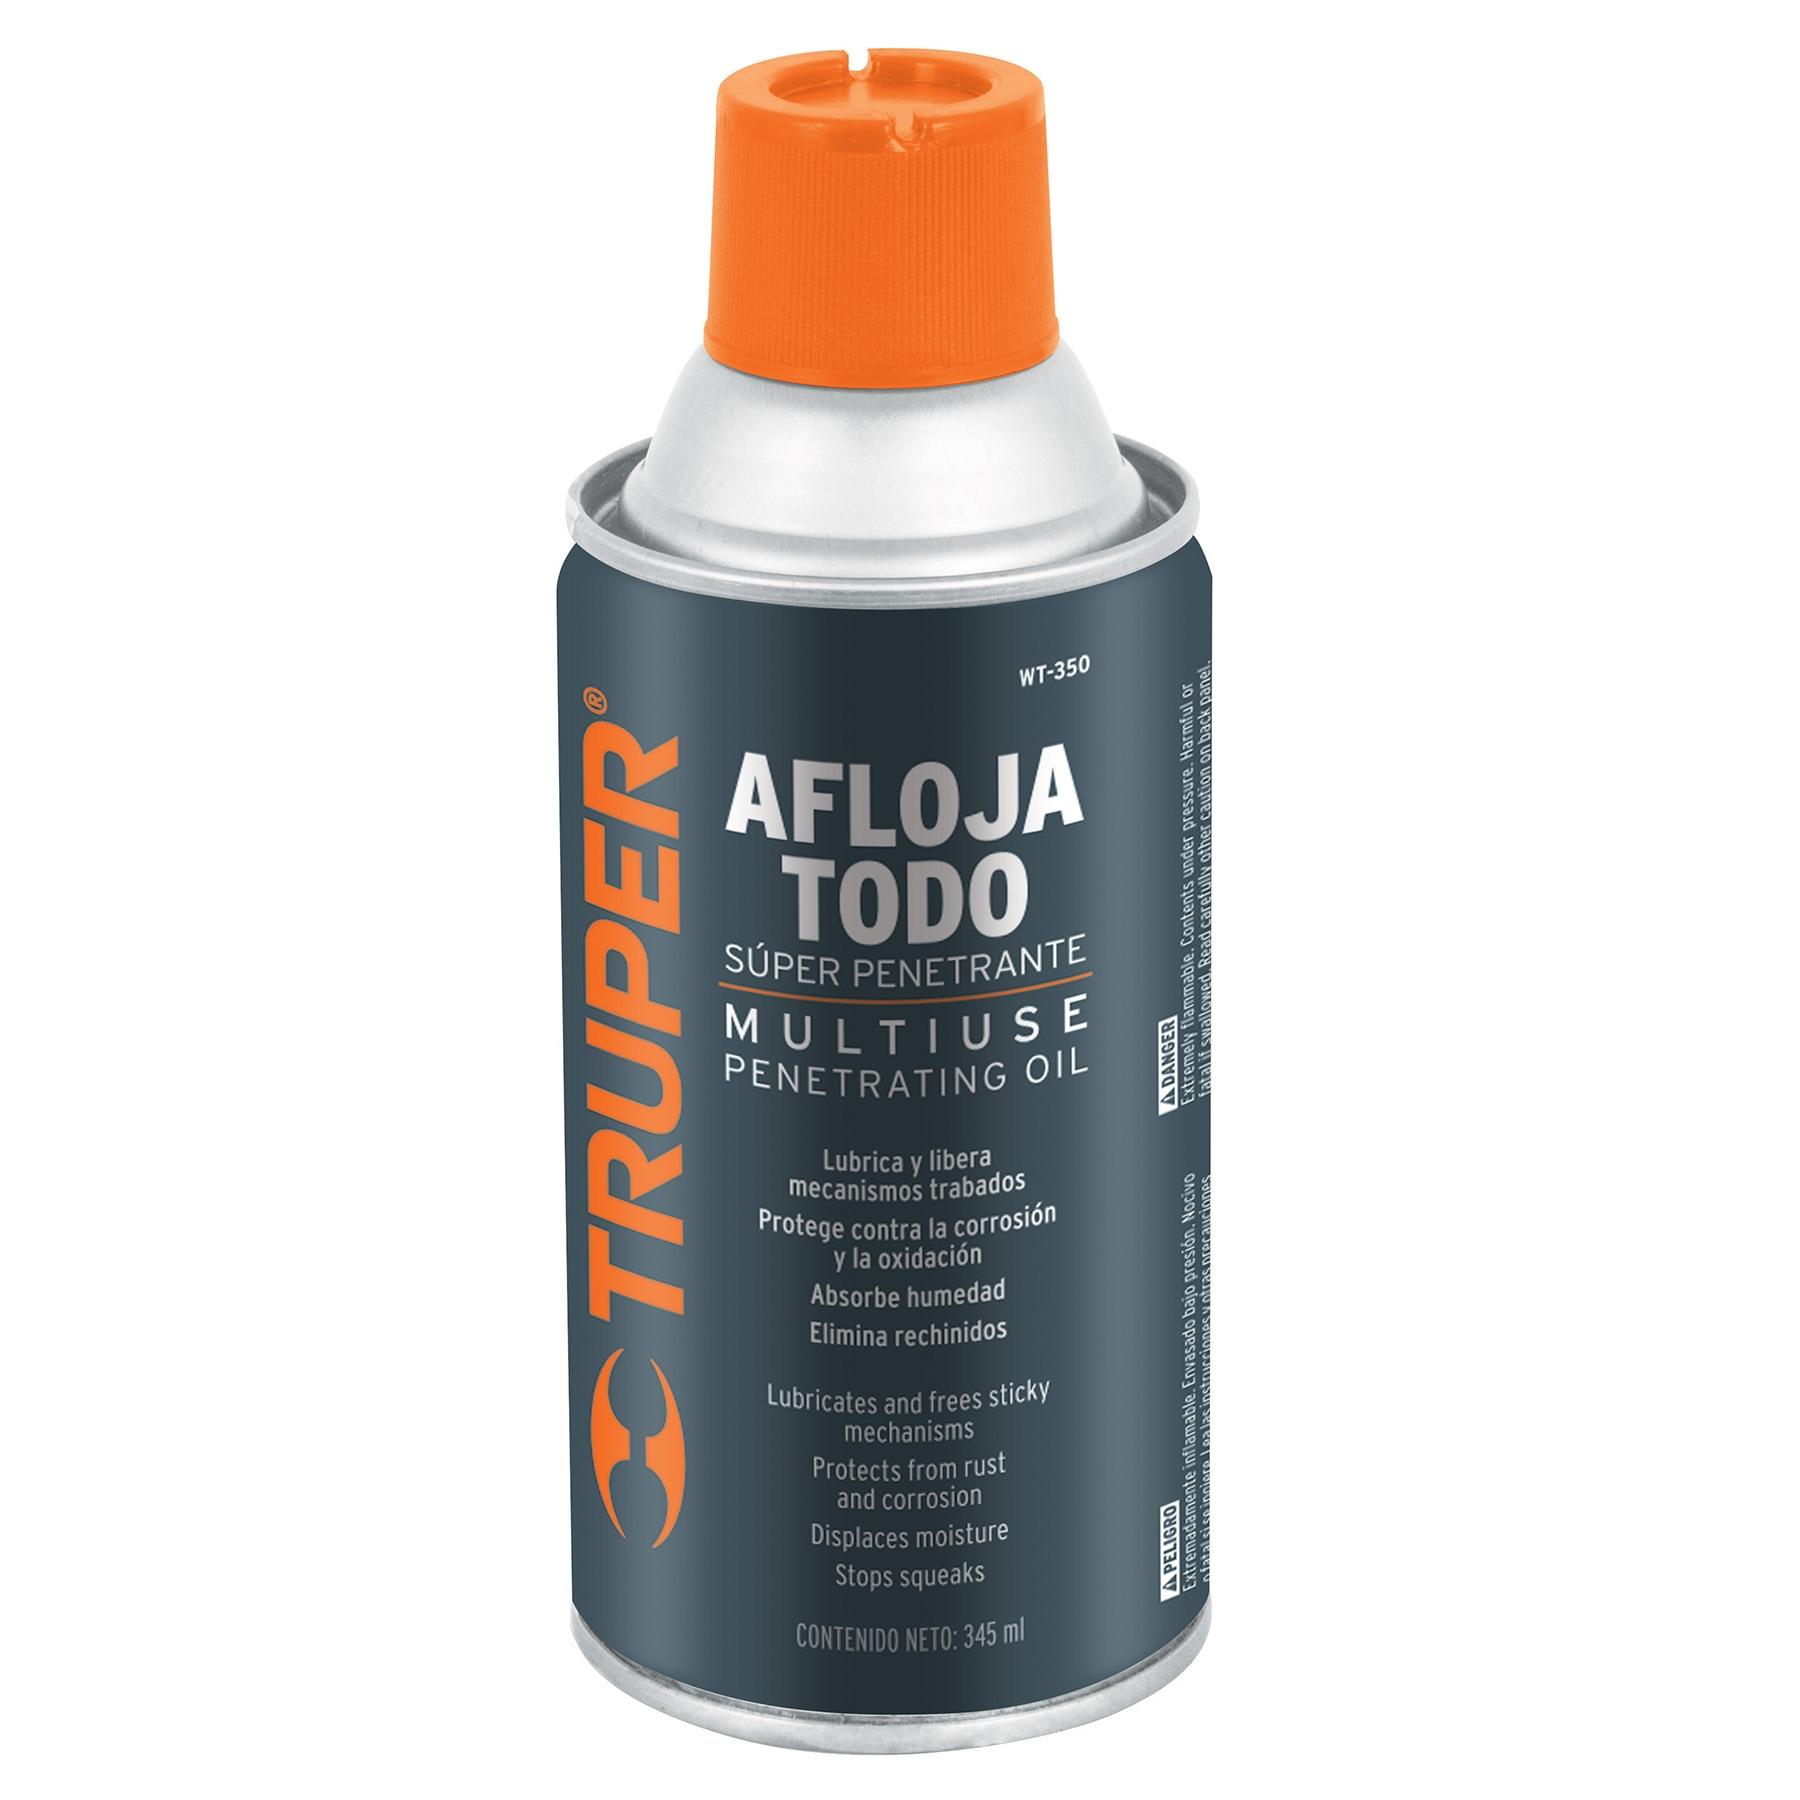 Aceite aflojatodo en aerosol, 345 ml